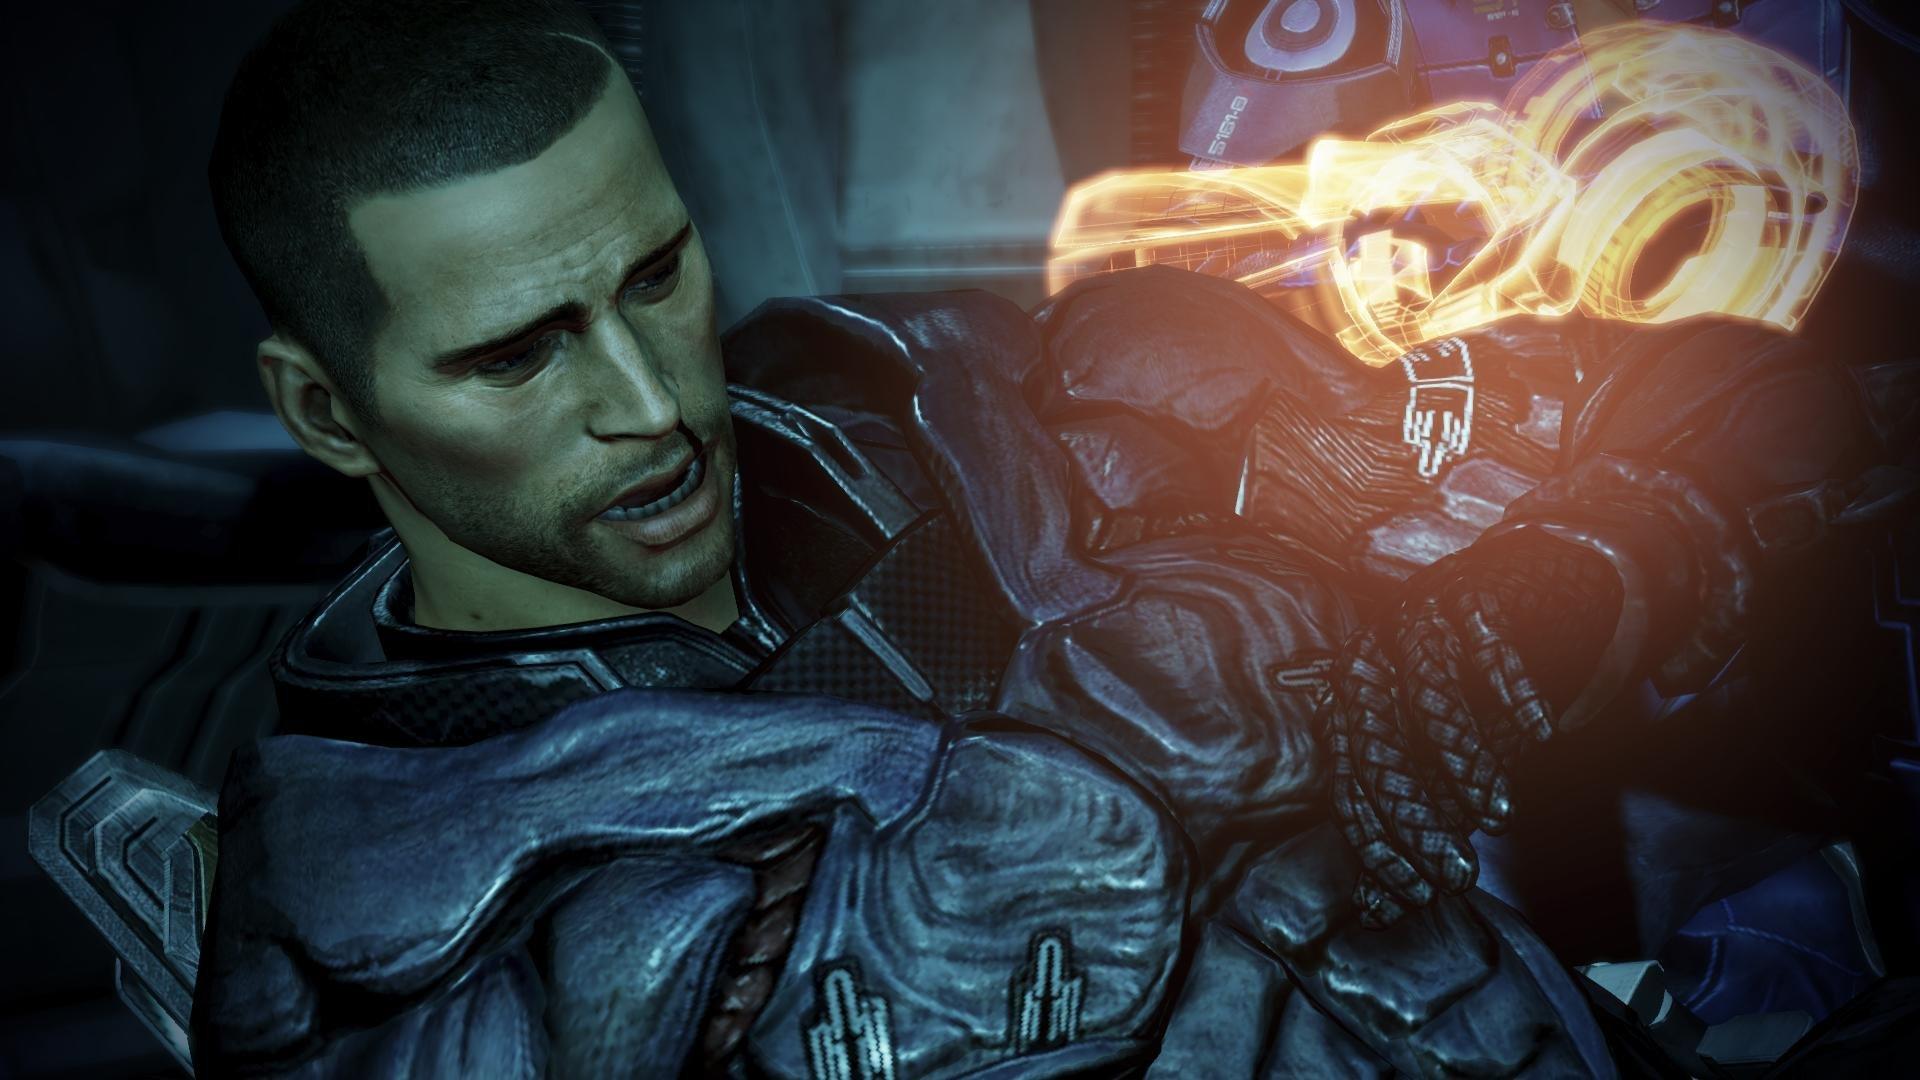 Free Download Mass Effect 3 Wallpaper Id 191939 1080p For Desktop